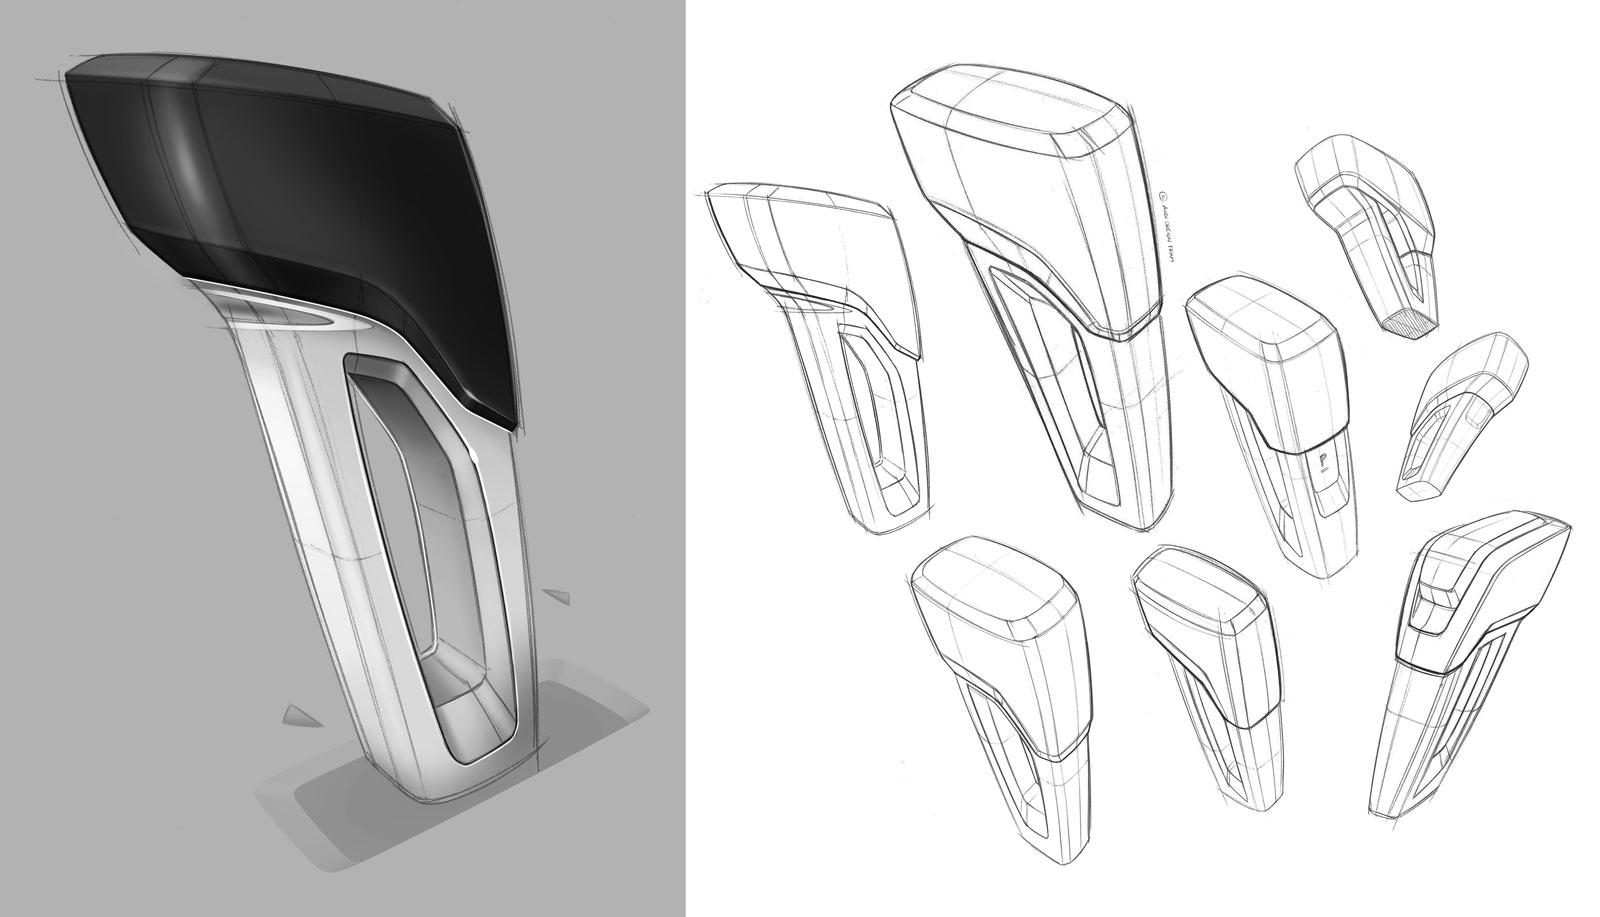 Audi-TT-Offroad-Concept-Interior-Design-Sketch-Gearbox-shift.jpg (JPEG Image, 1600×917 pixels) - Scaled (82%)